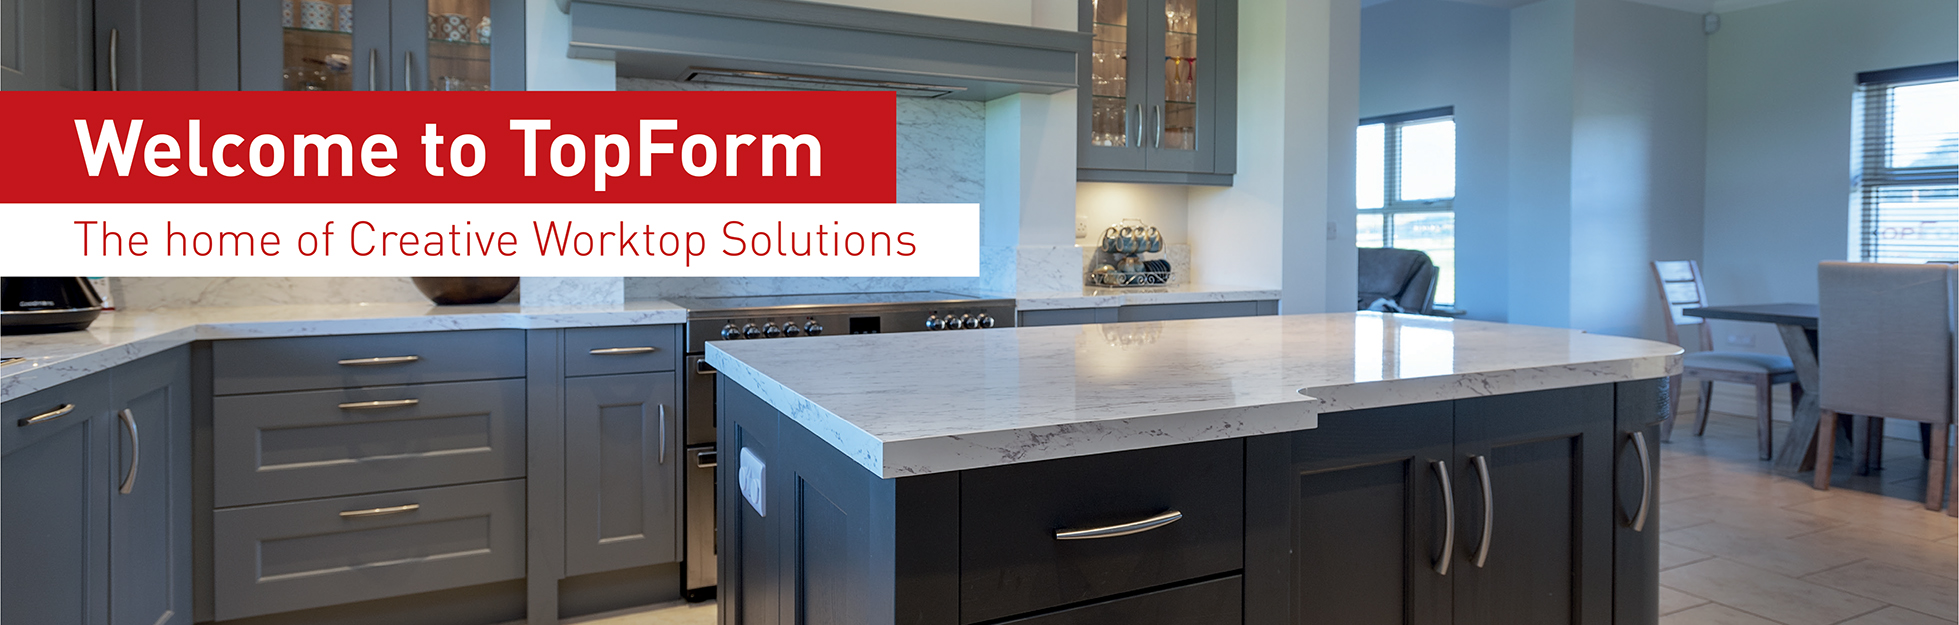 Topform-Homepage-Cover